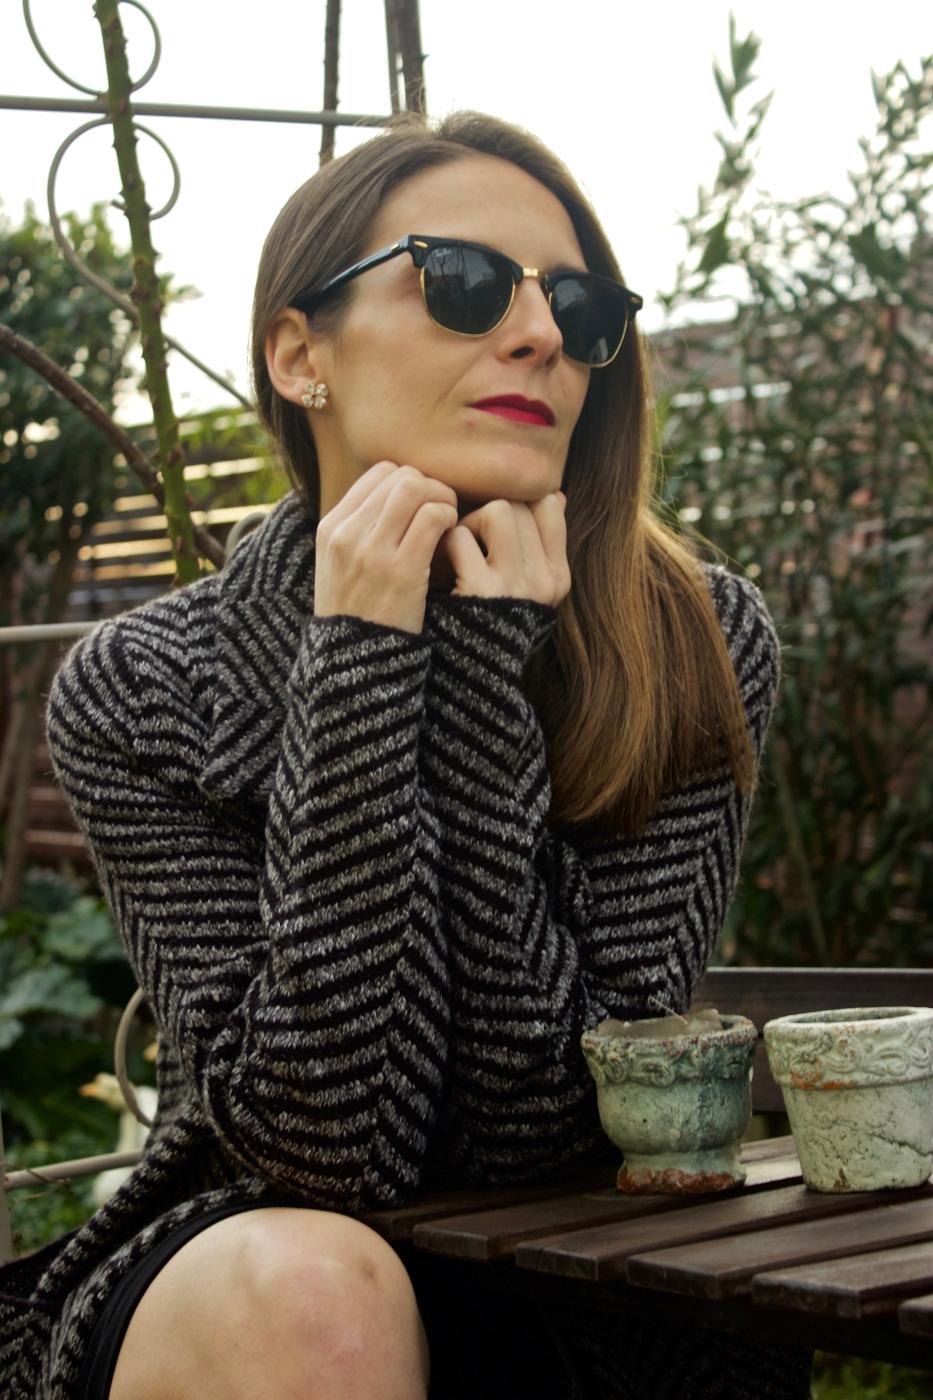 lara-vazquez-madlula-fashion-ootd-look-winter-vogue